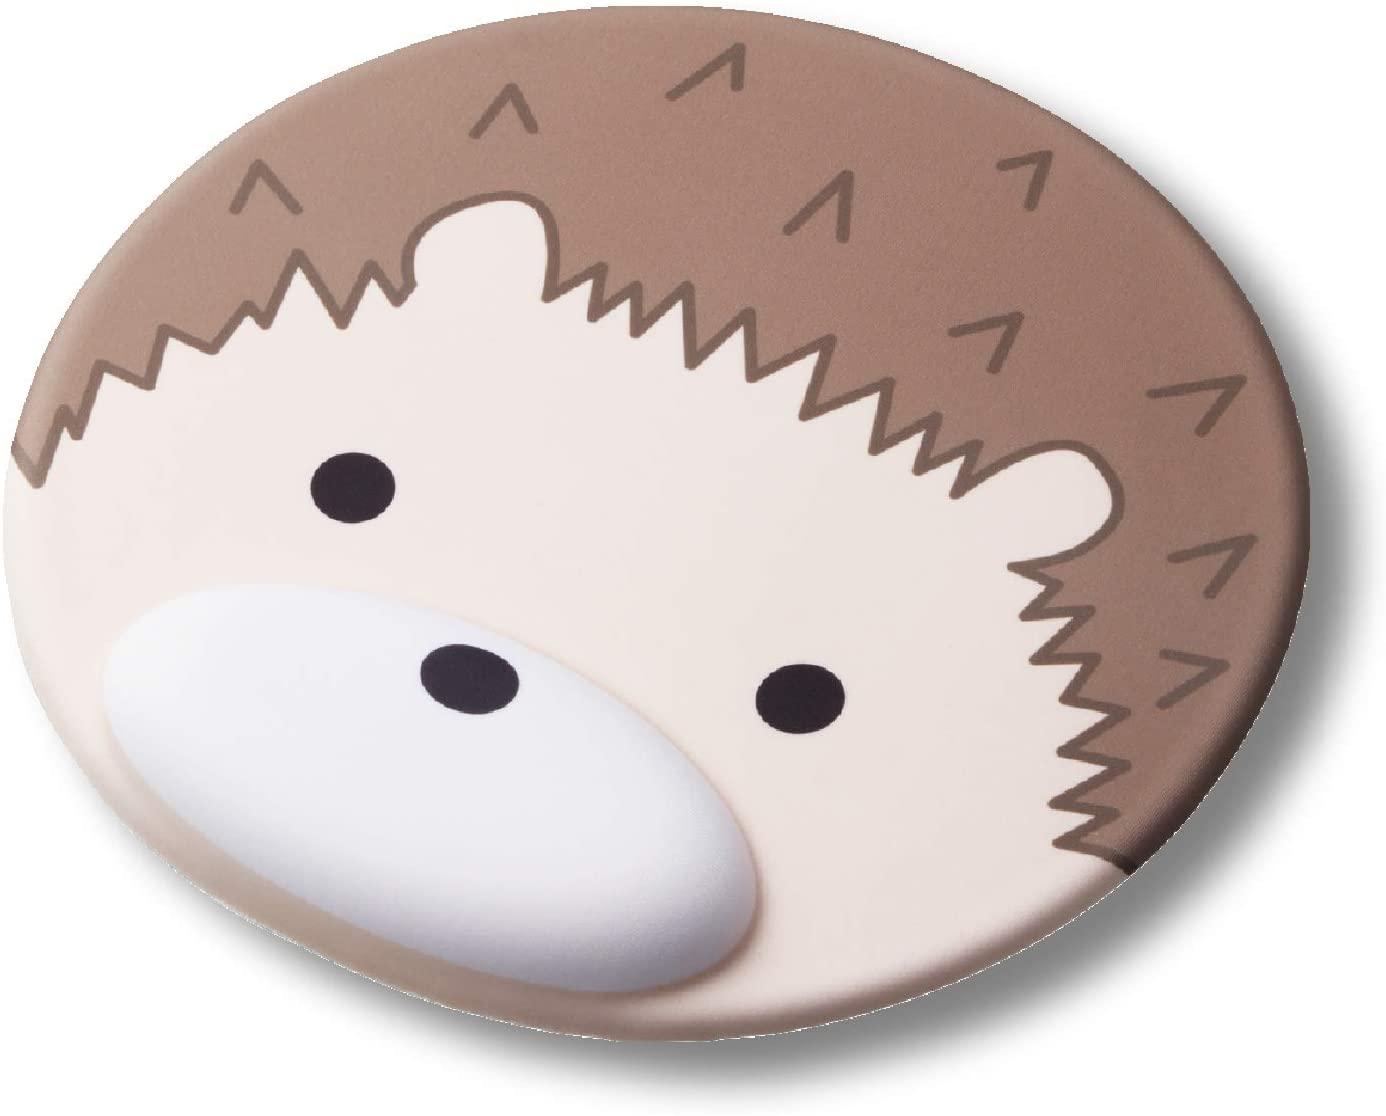 ELECOM Animal Mouse Pad with Wrist RestErgonomic Design Reduce Fatigue, Hedgehog (MP-AN01HED)